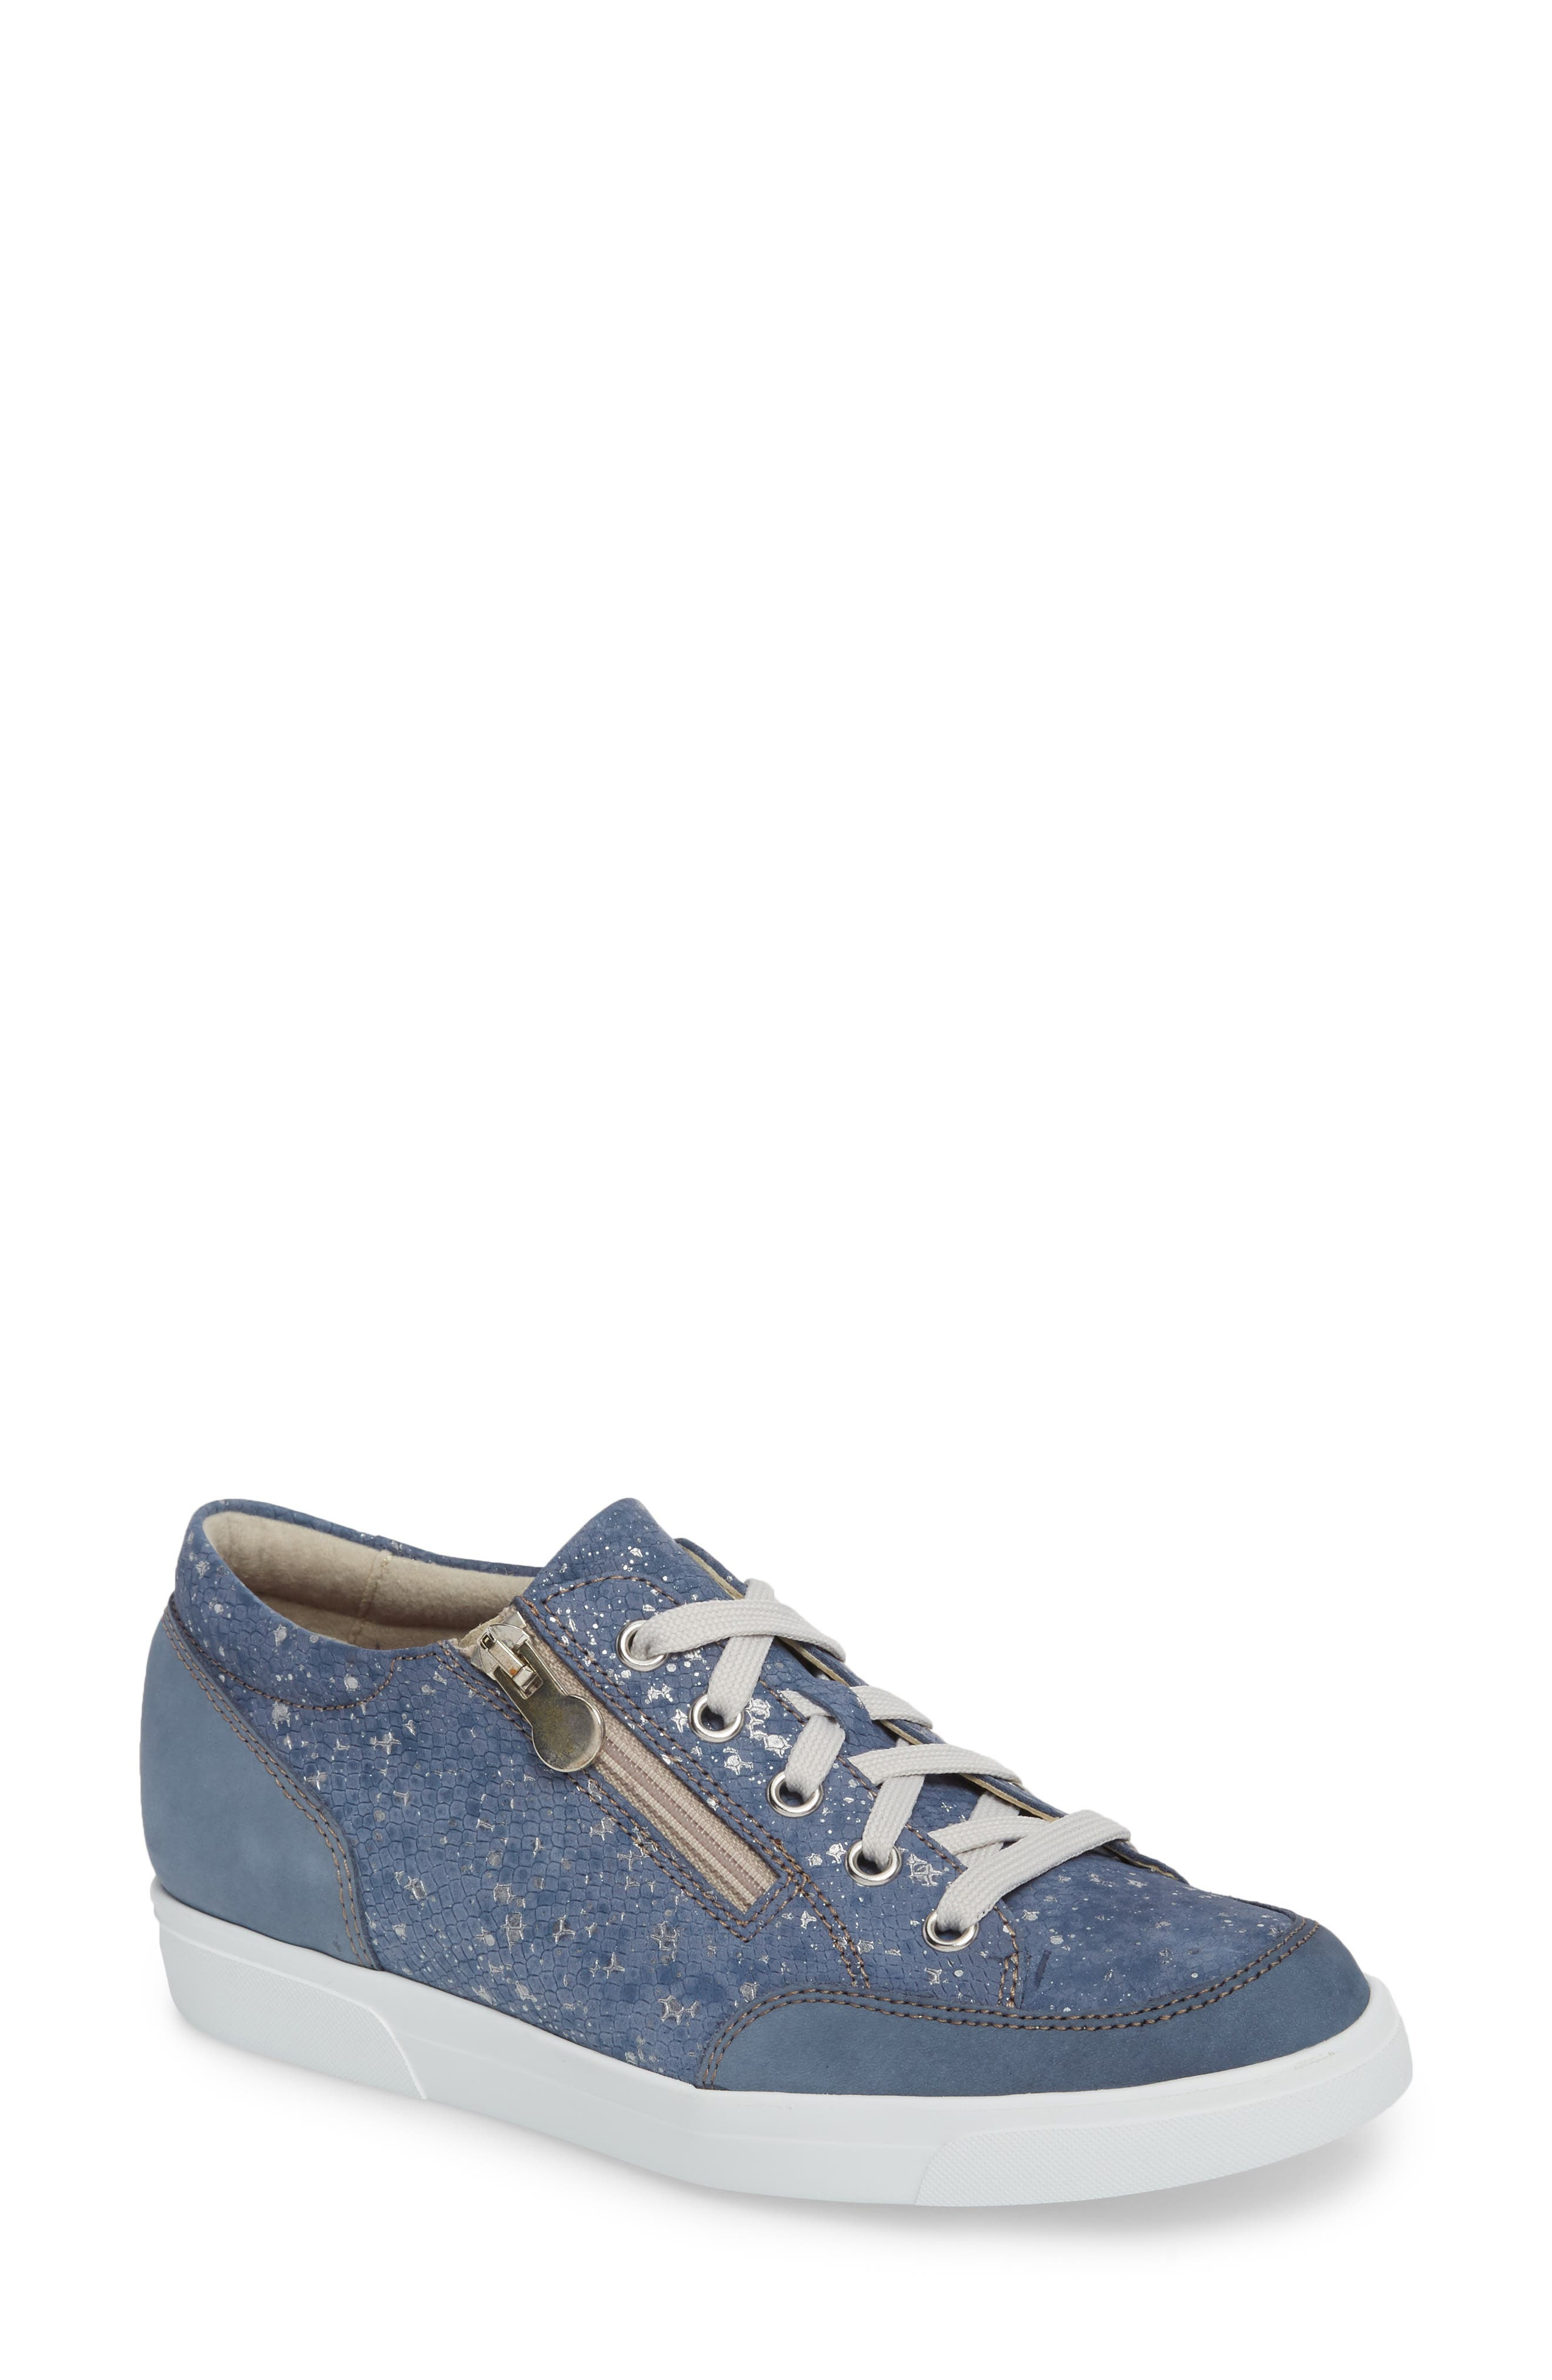 Munro Gabbie Sneaker, Blue